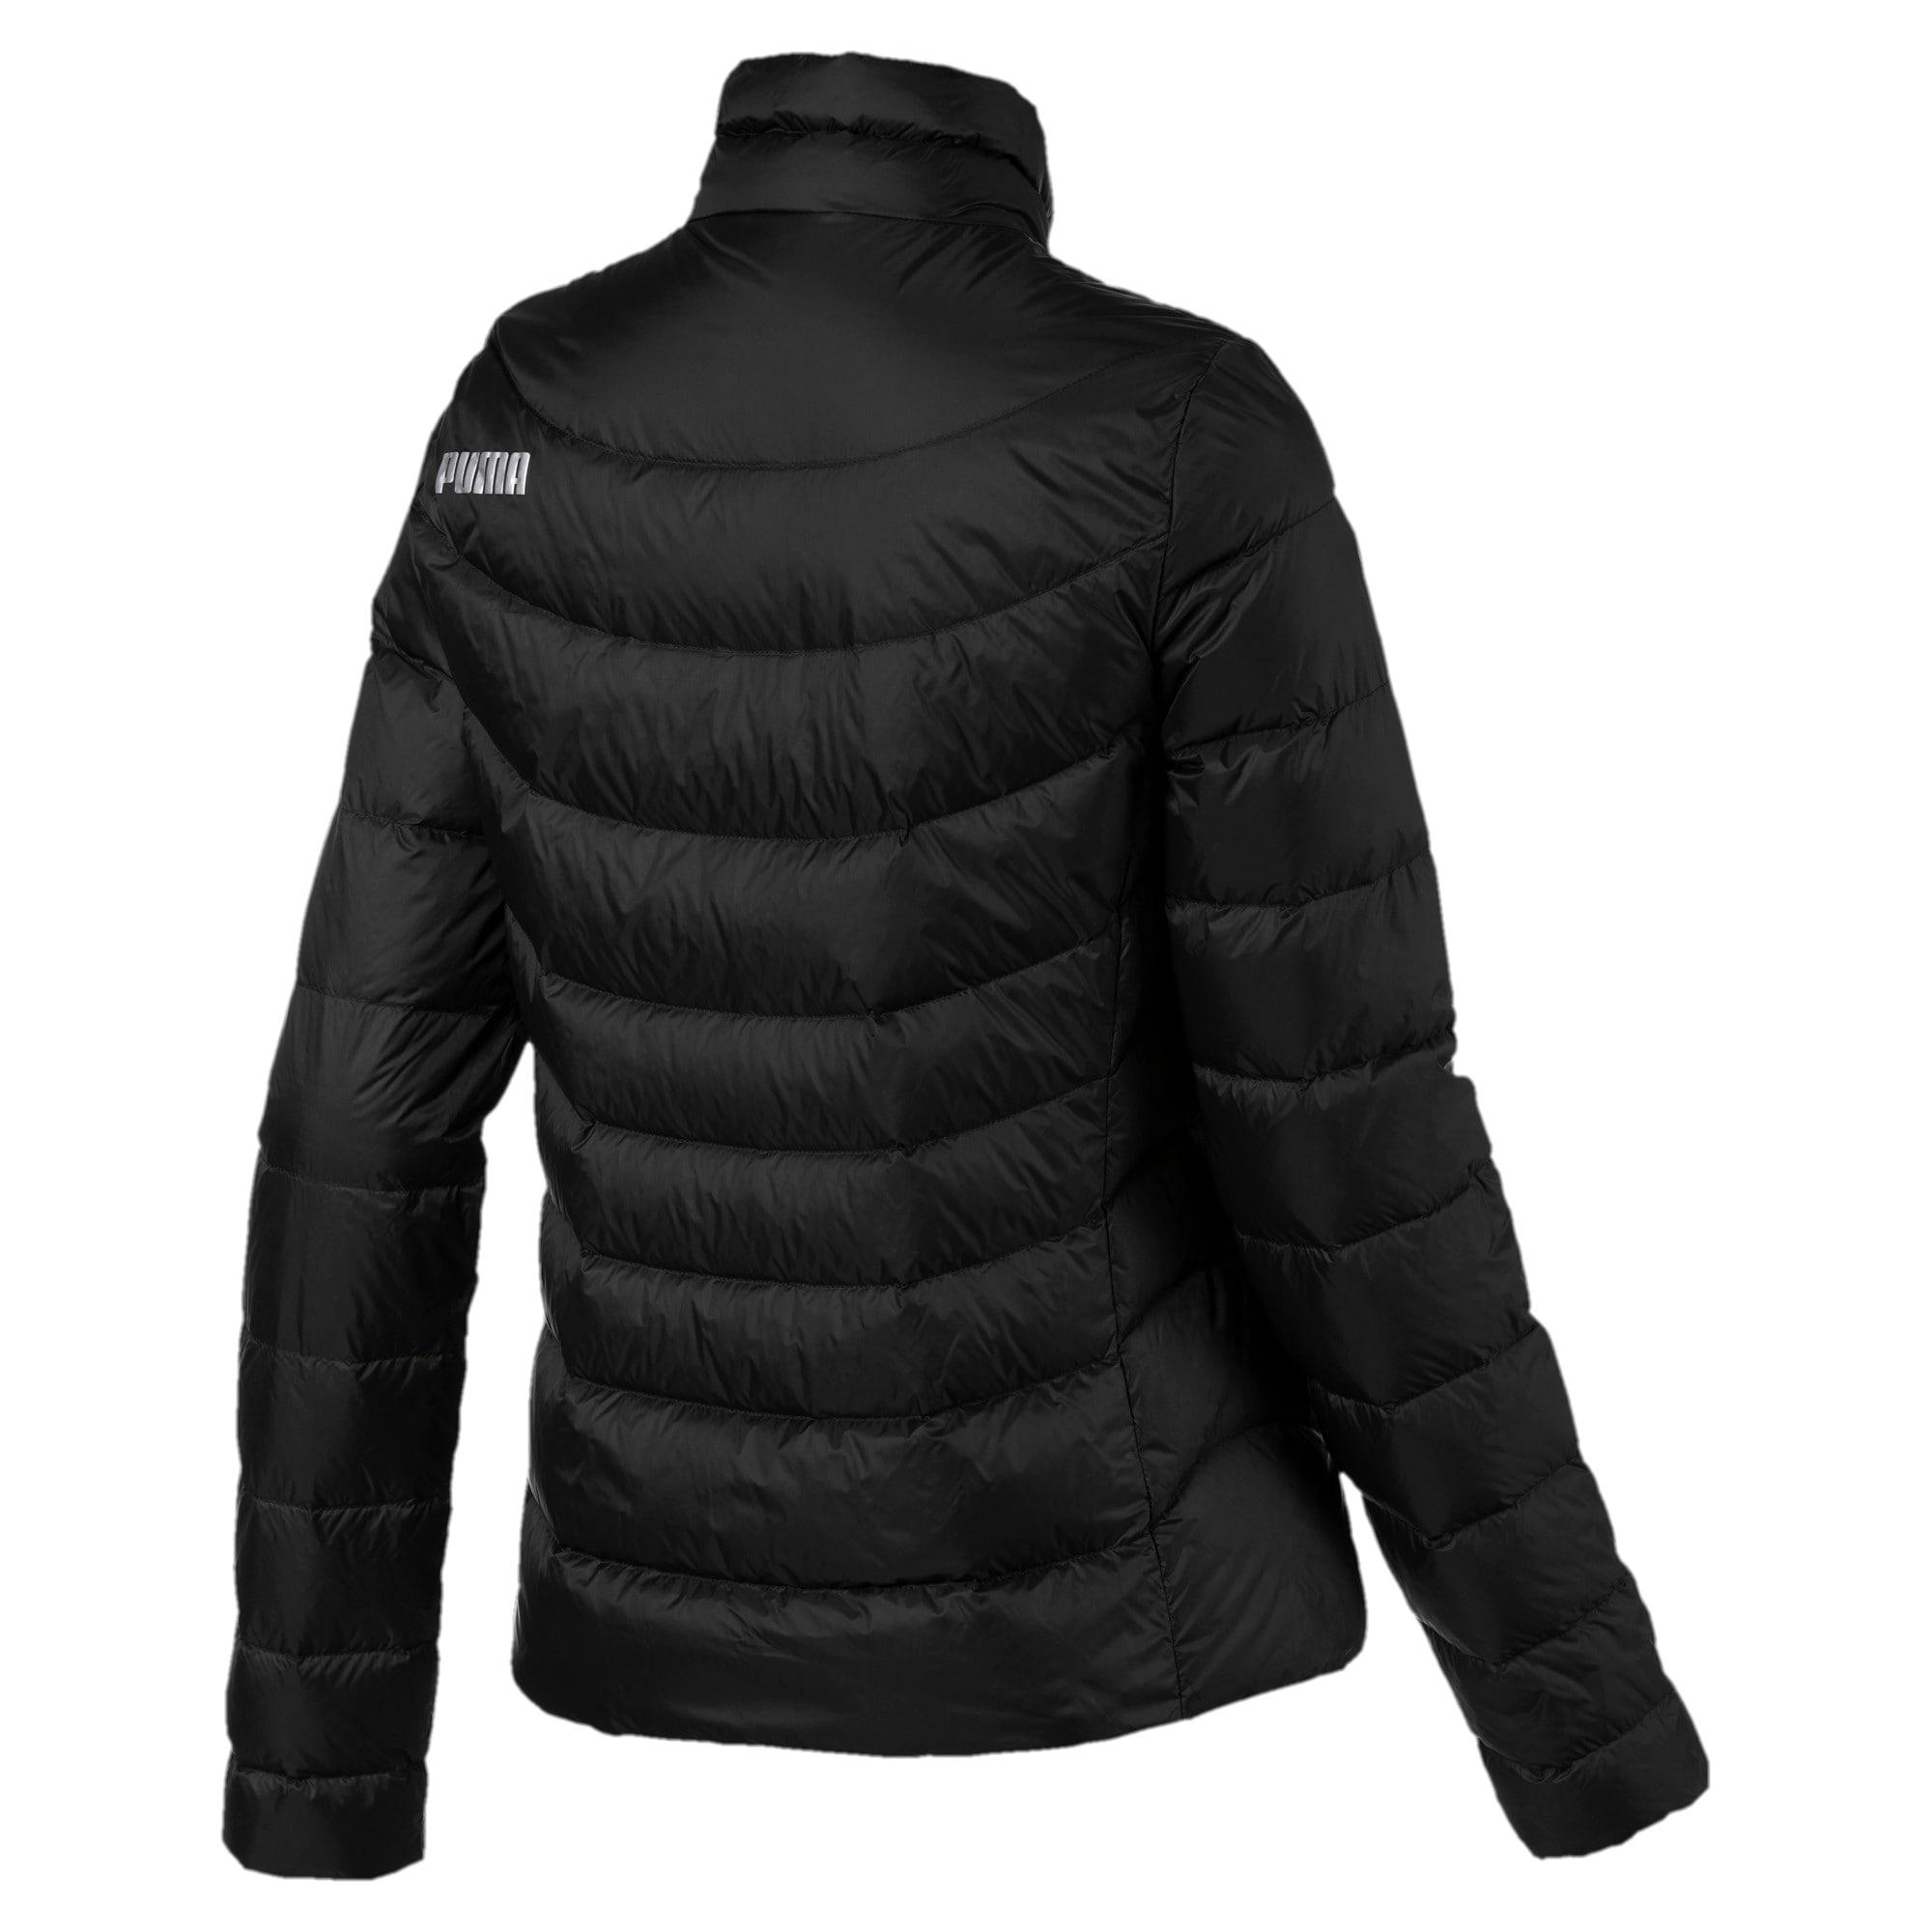 Thumbnail 5 of PWRWarm packLITE 600 Down Women's Jacket, Puma Black, medium